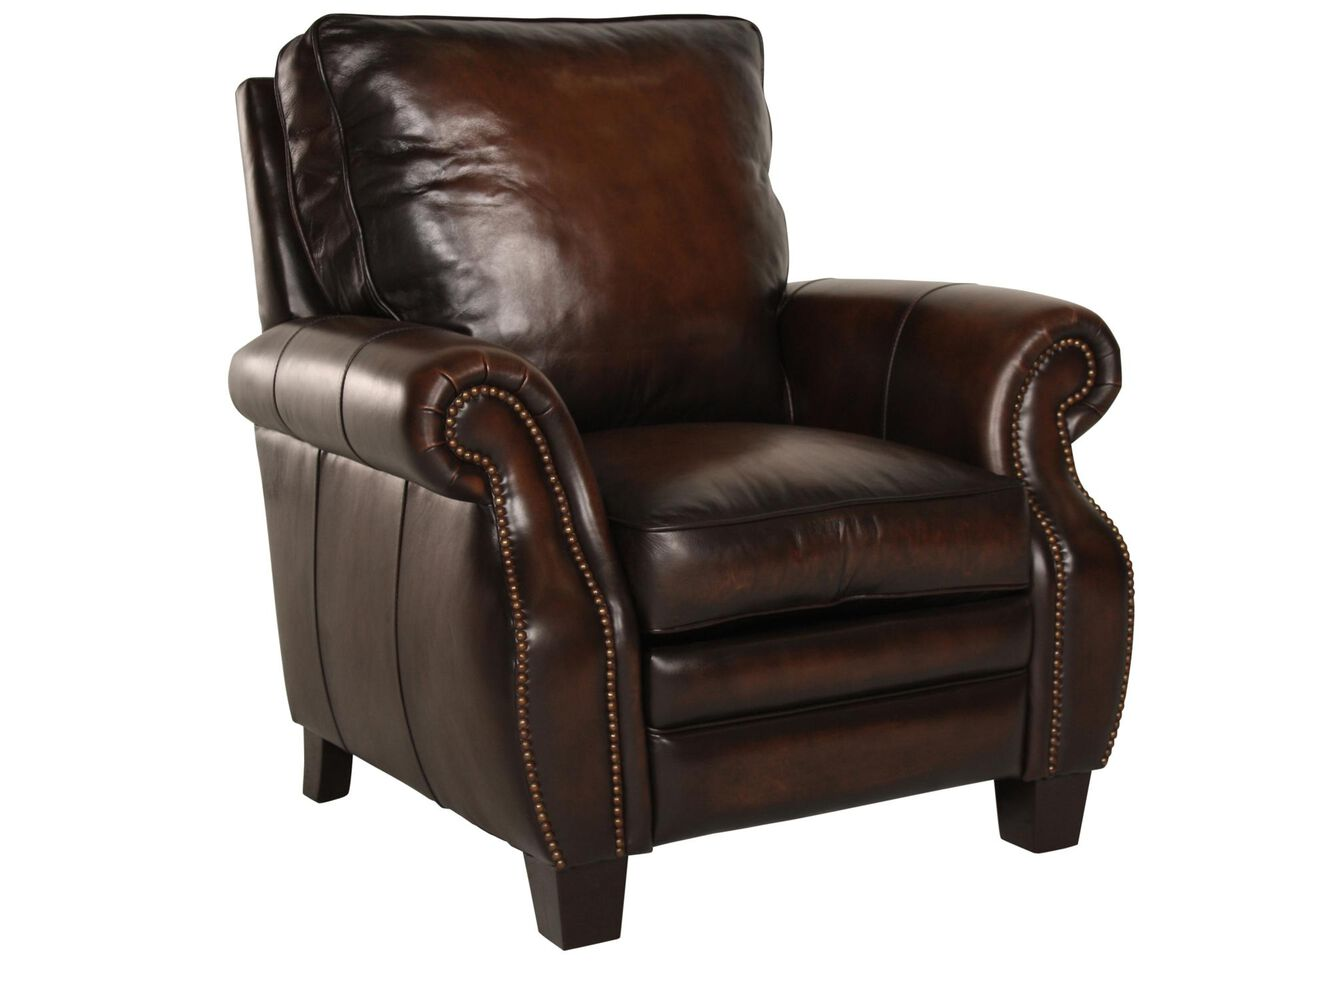 Club chair recliner - Bernhardt Leather Recliner